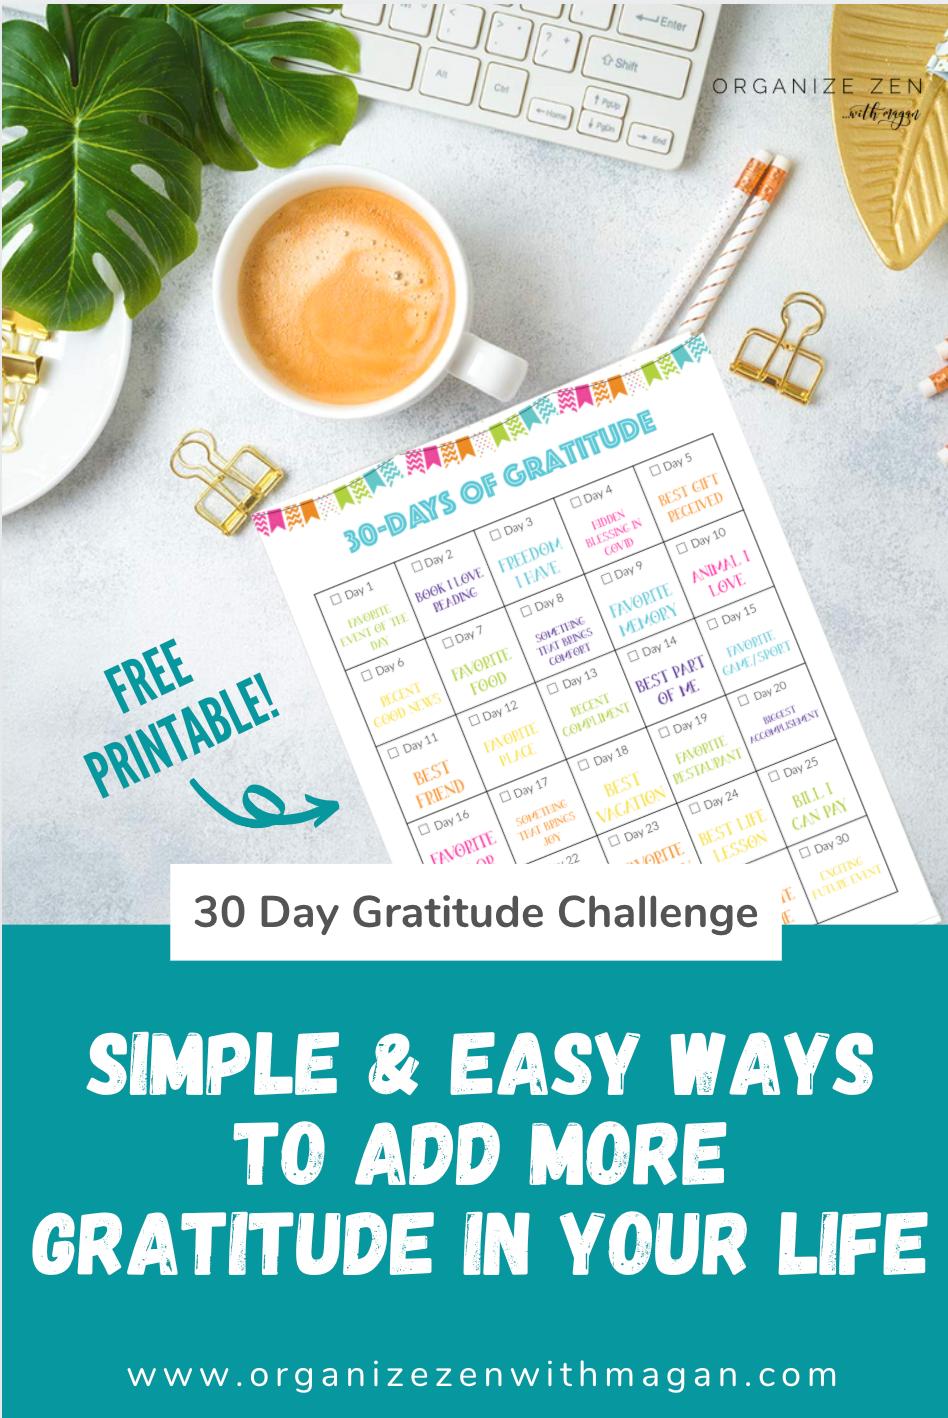 Printable 30 Days of Gratitude Challenge Calendar